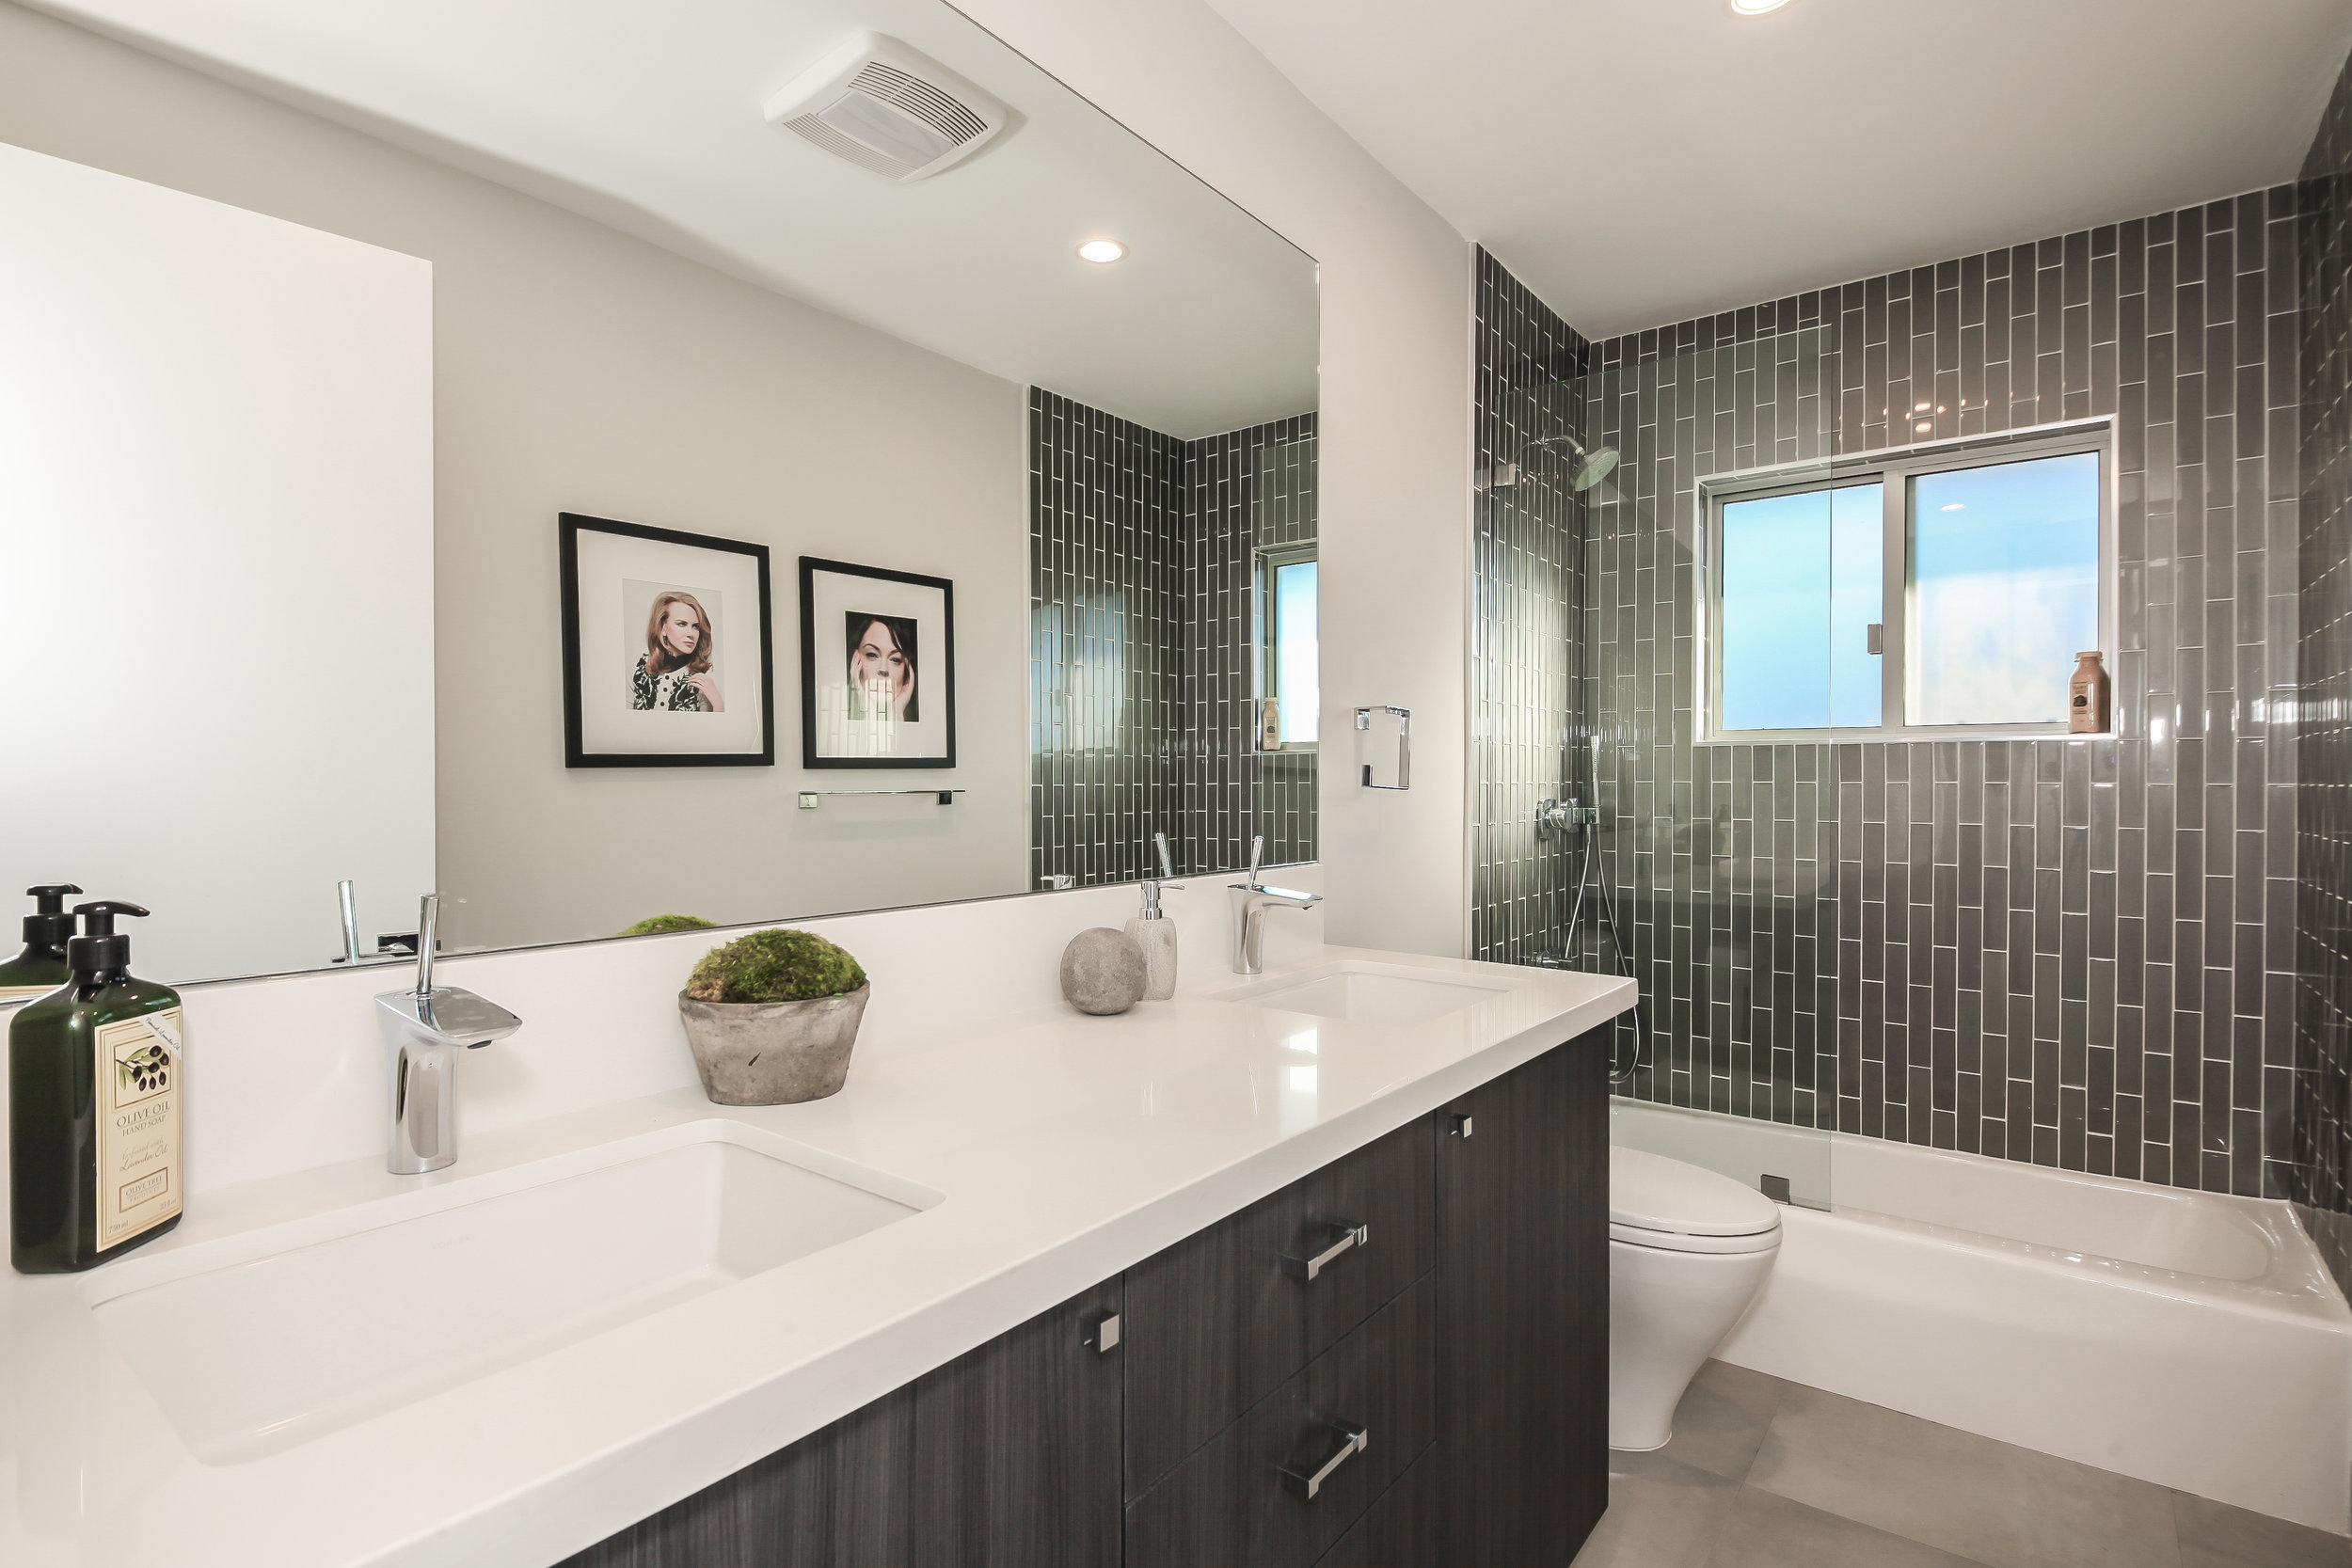 036-photo-bathroom-1956471.jpg